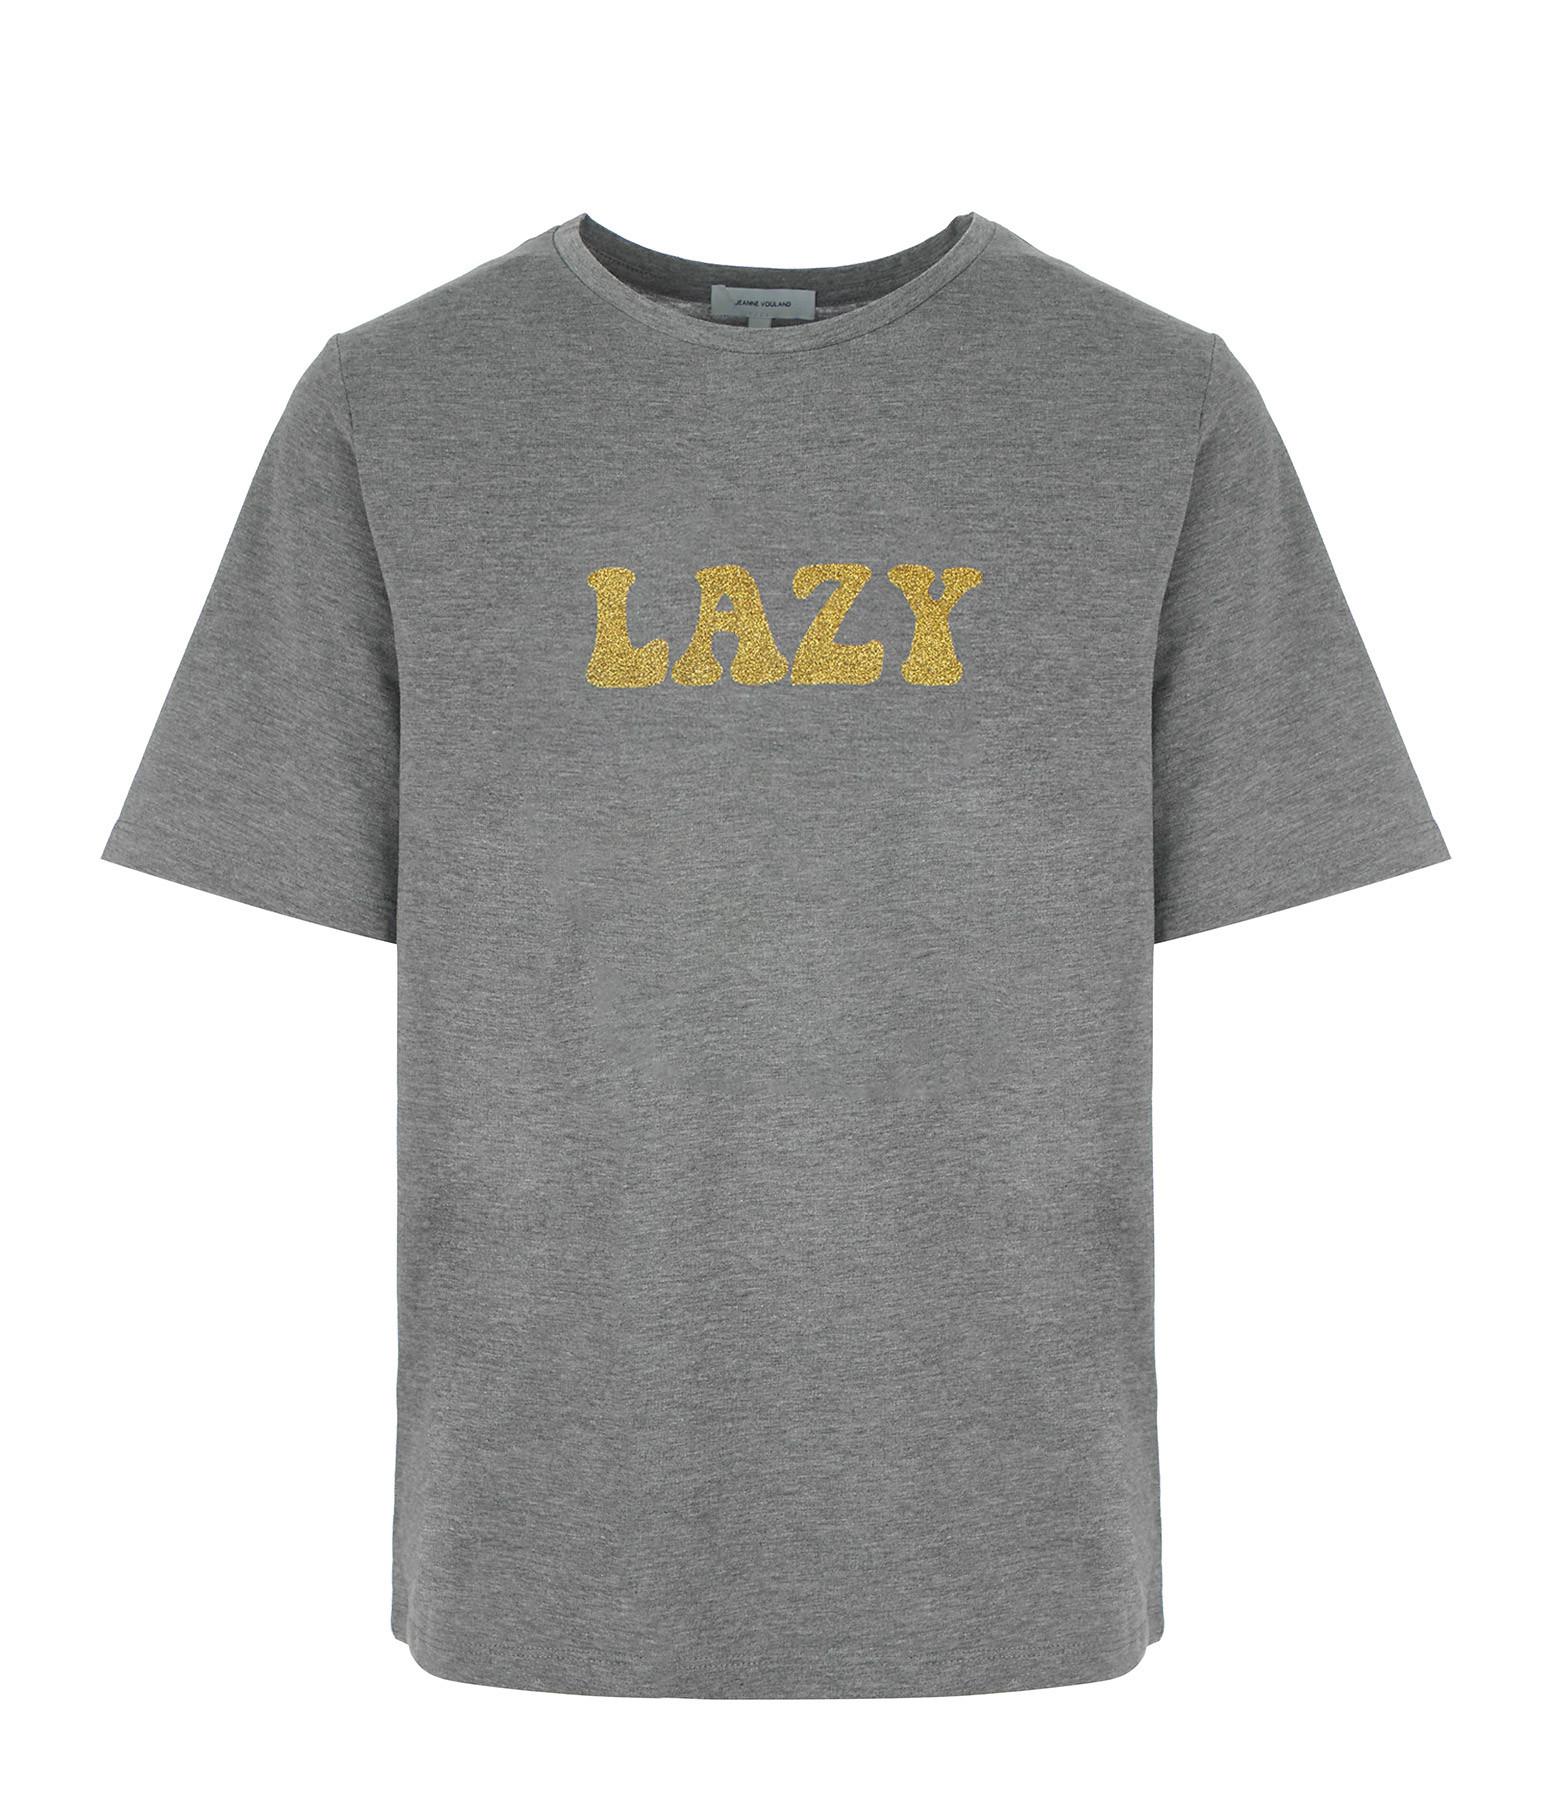 JEANNE VOULAND - Tee-shirt Gus Lazy Glitter Doré Gris